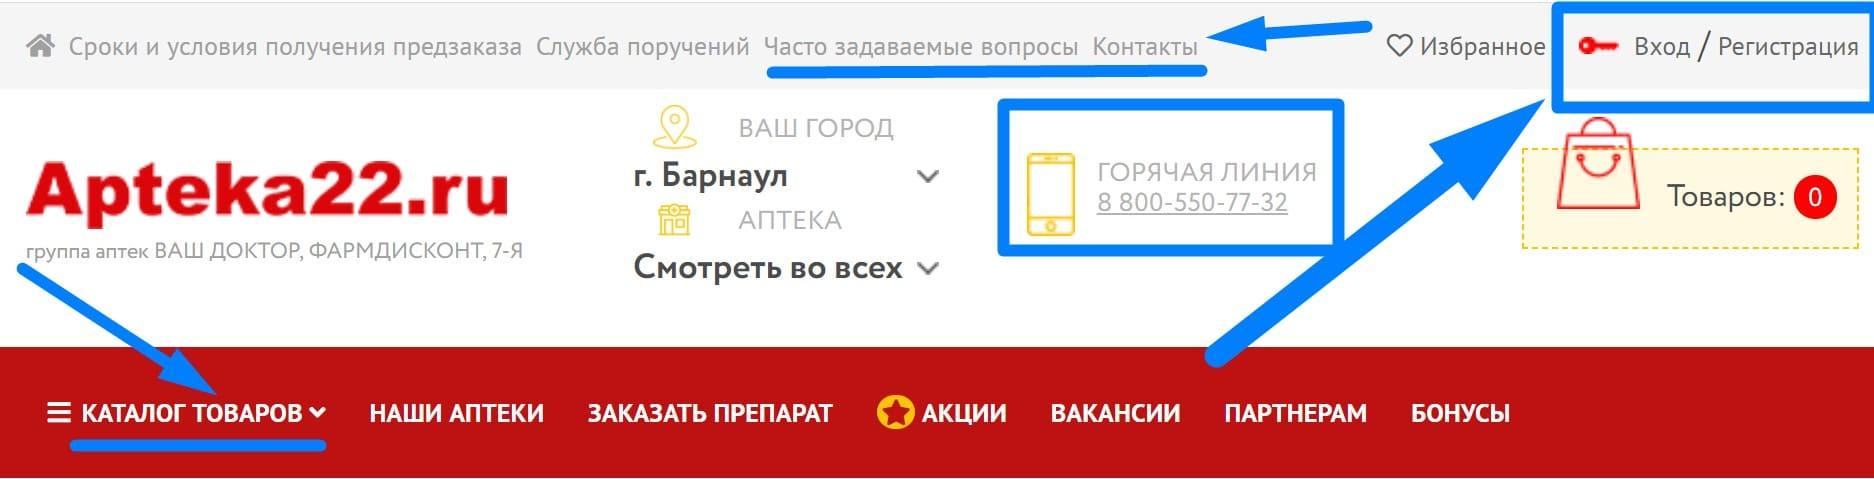 Аптека 22 Ру сайт